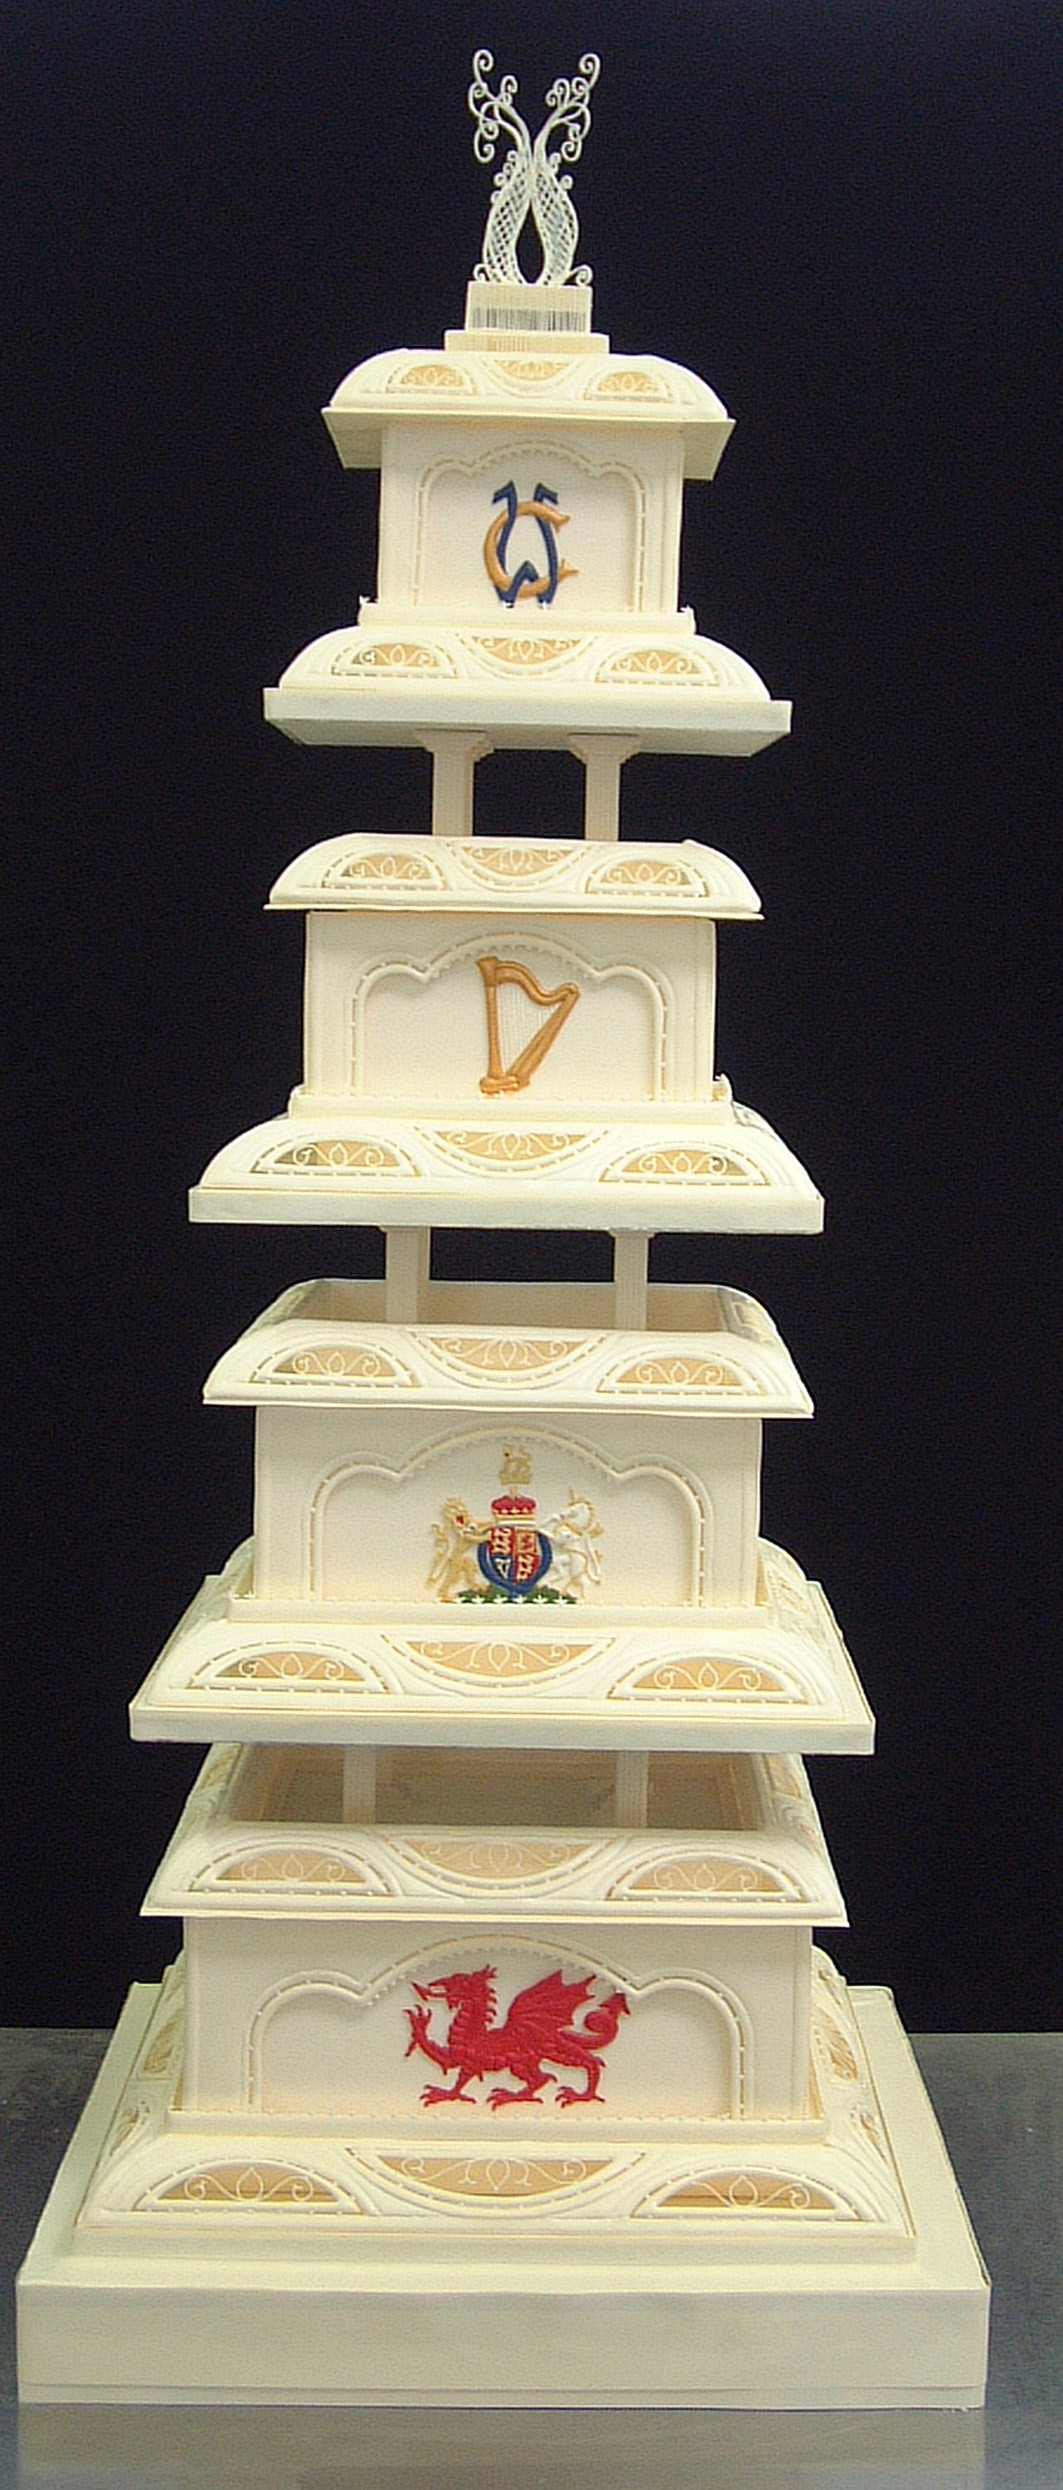 Royal Wedding Cakes  Redirection in progress